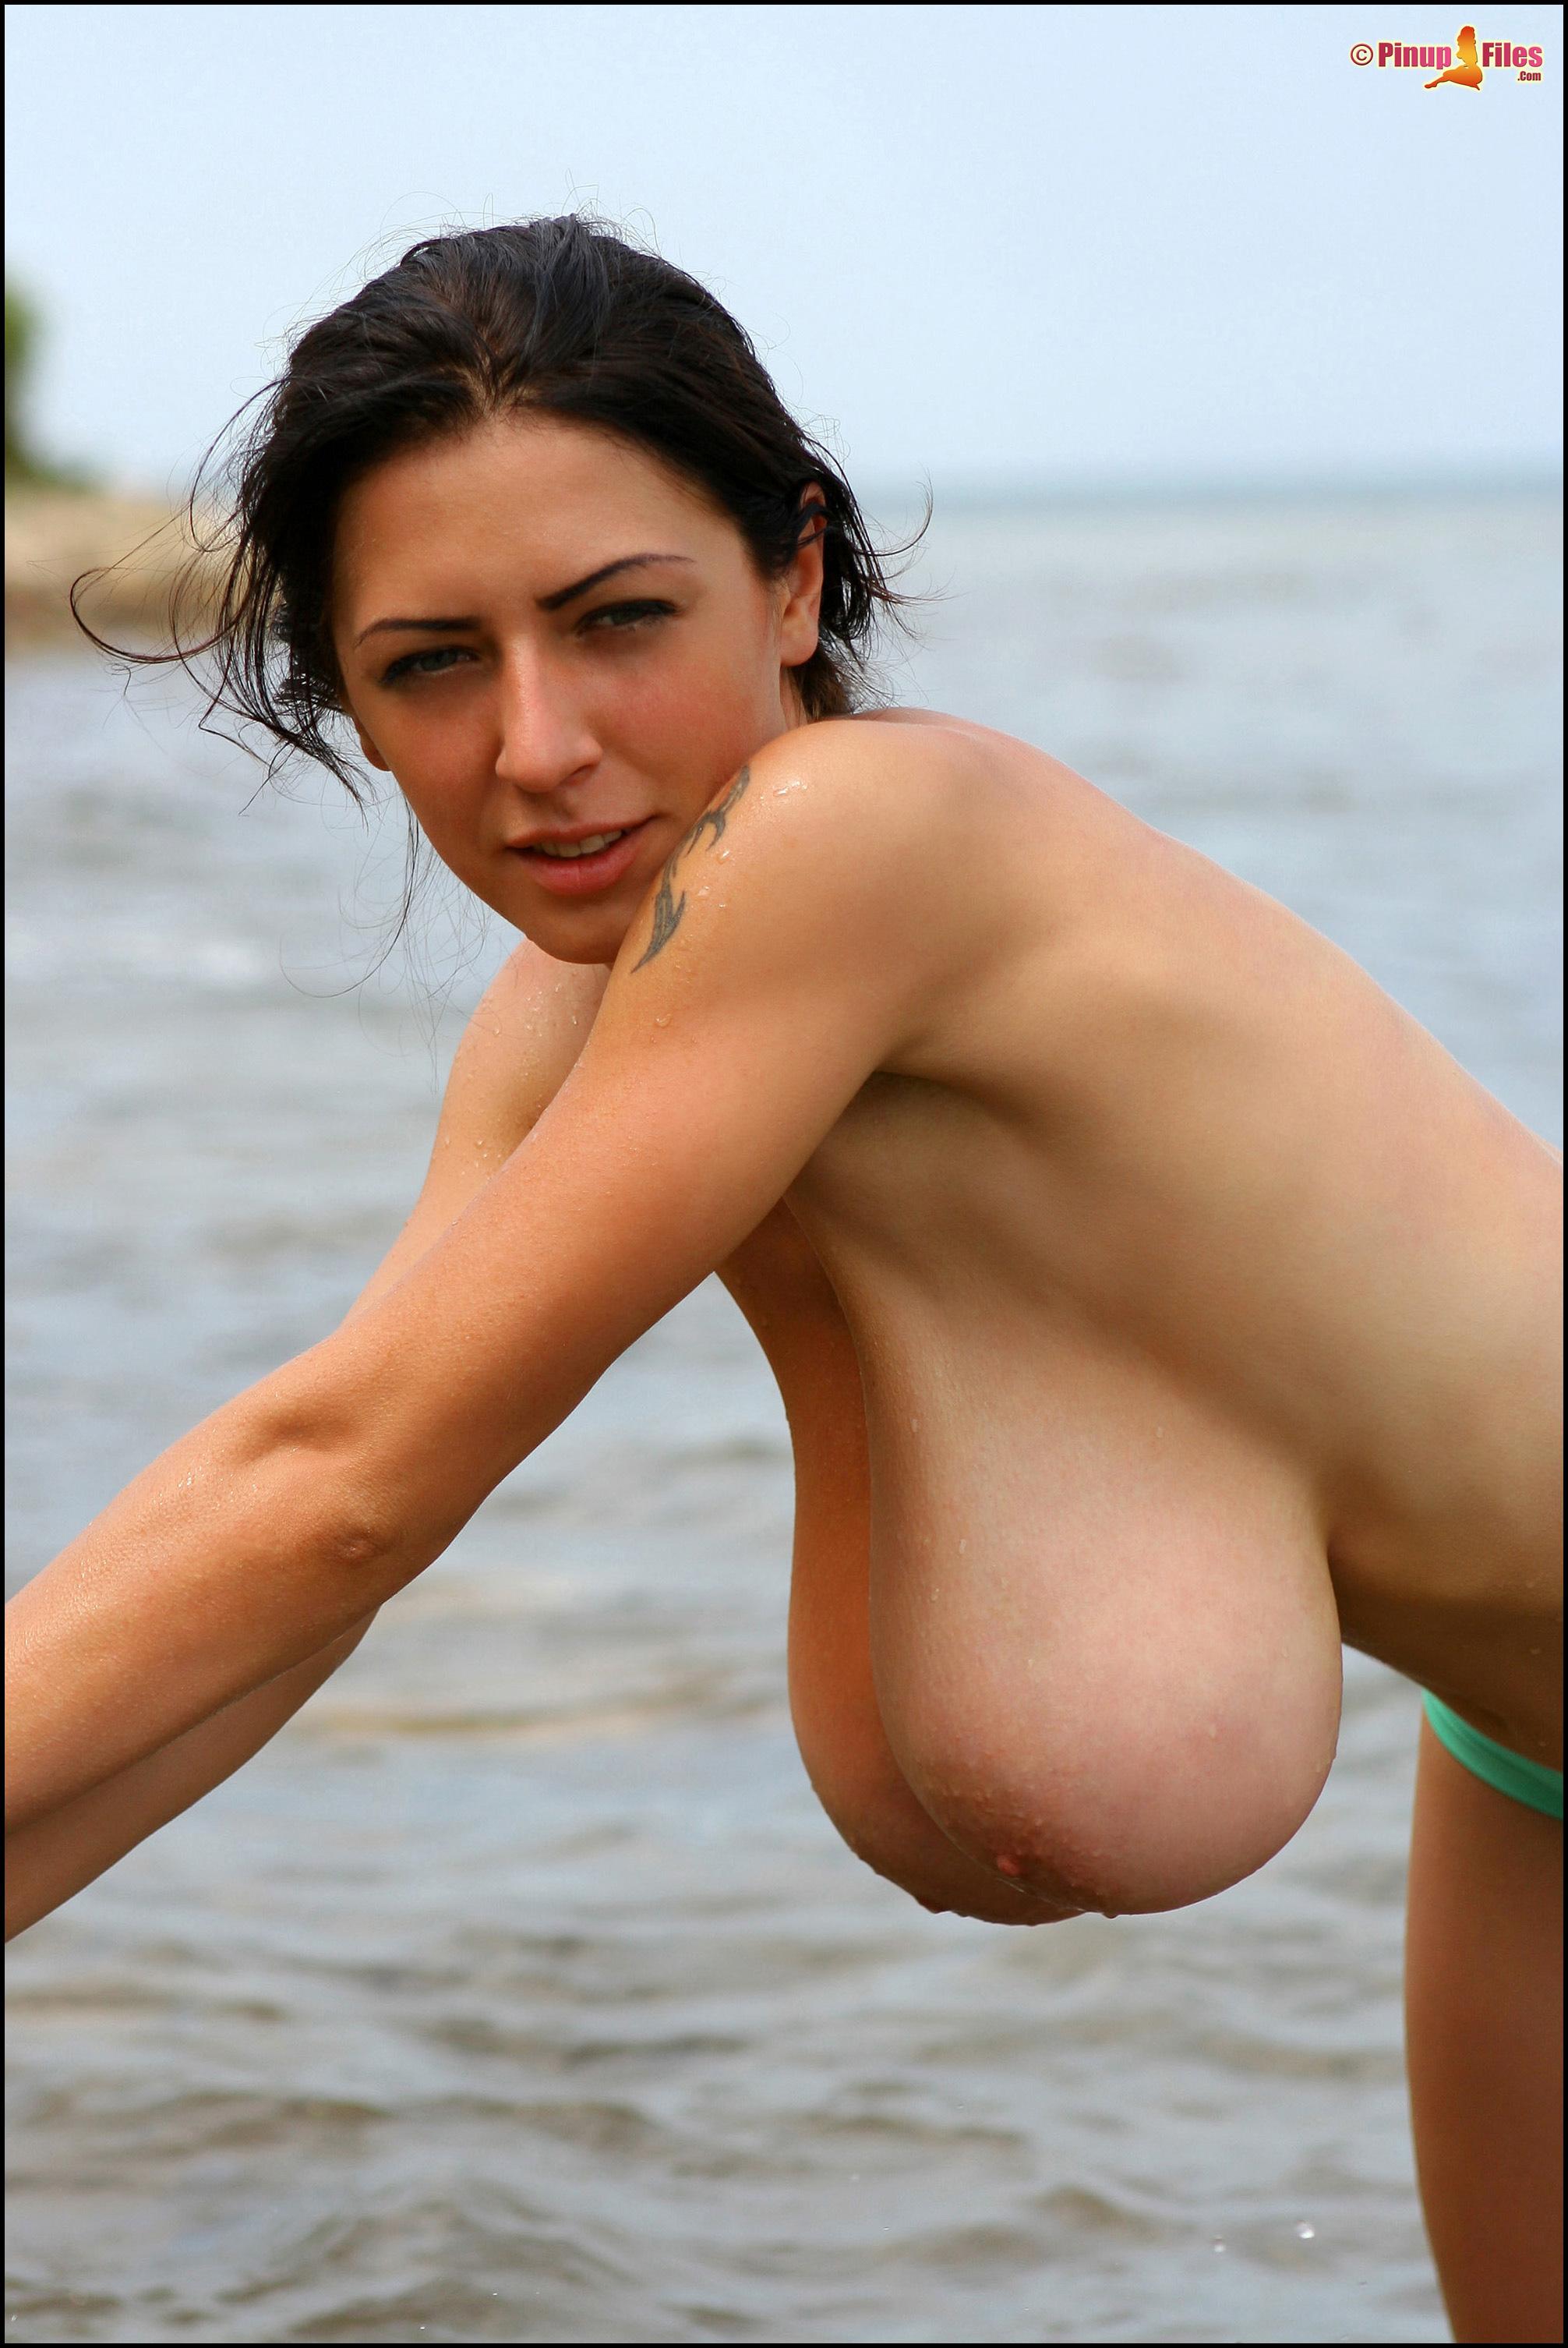 Big Breast Archive: anyazenkova